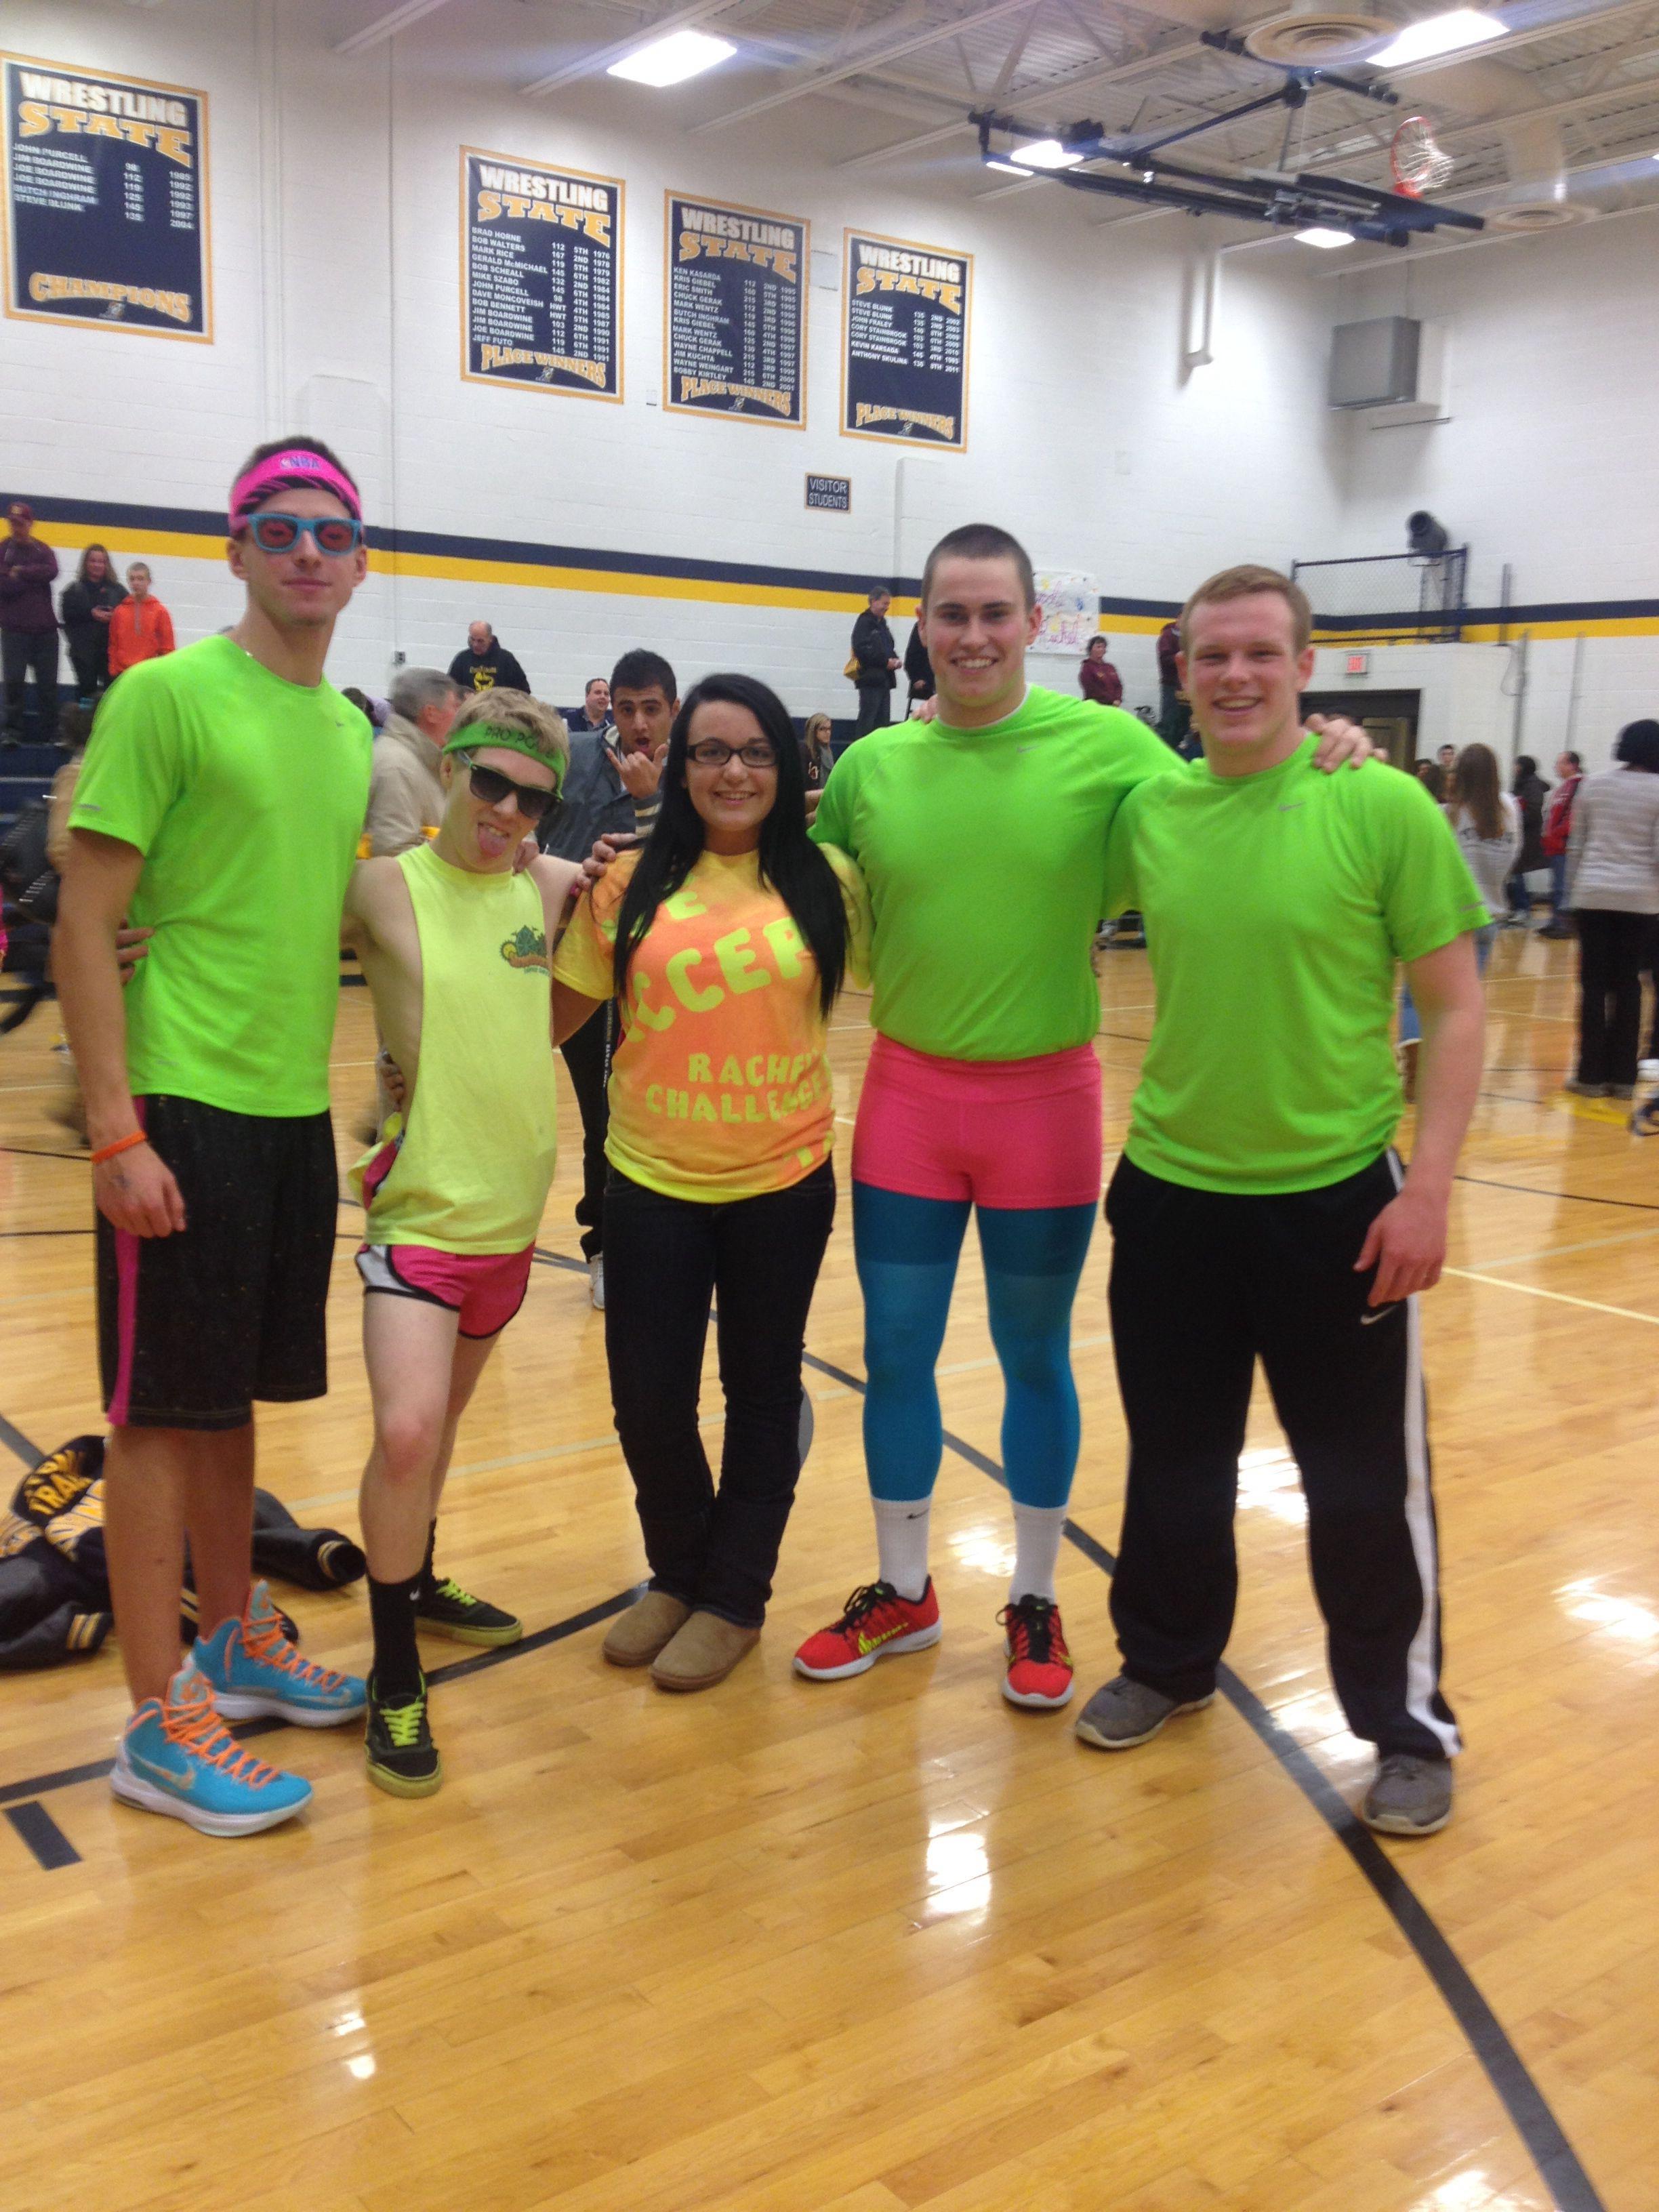 Neon Theme Rachel S Challenge Student Section Accepts